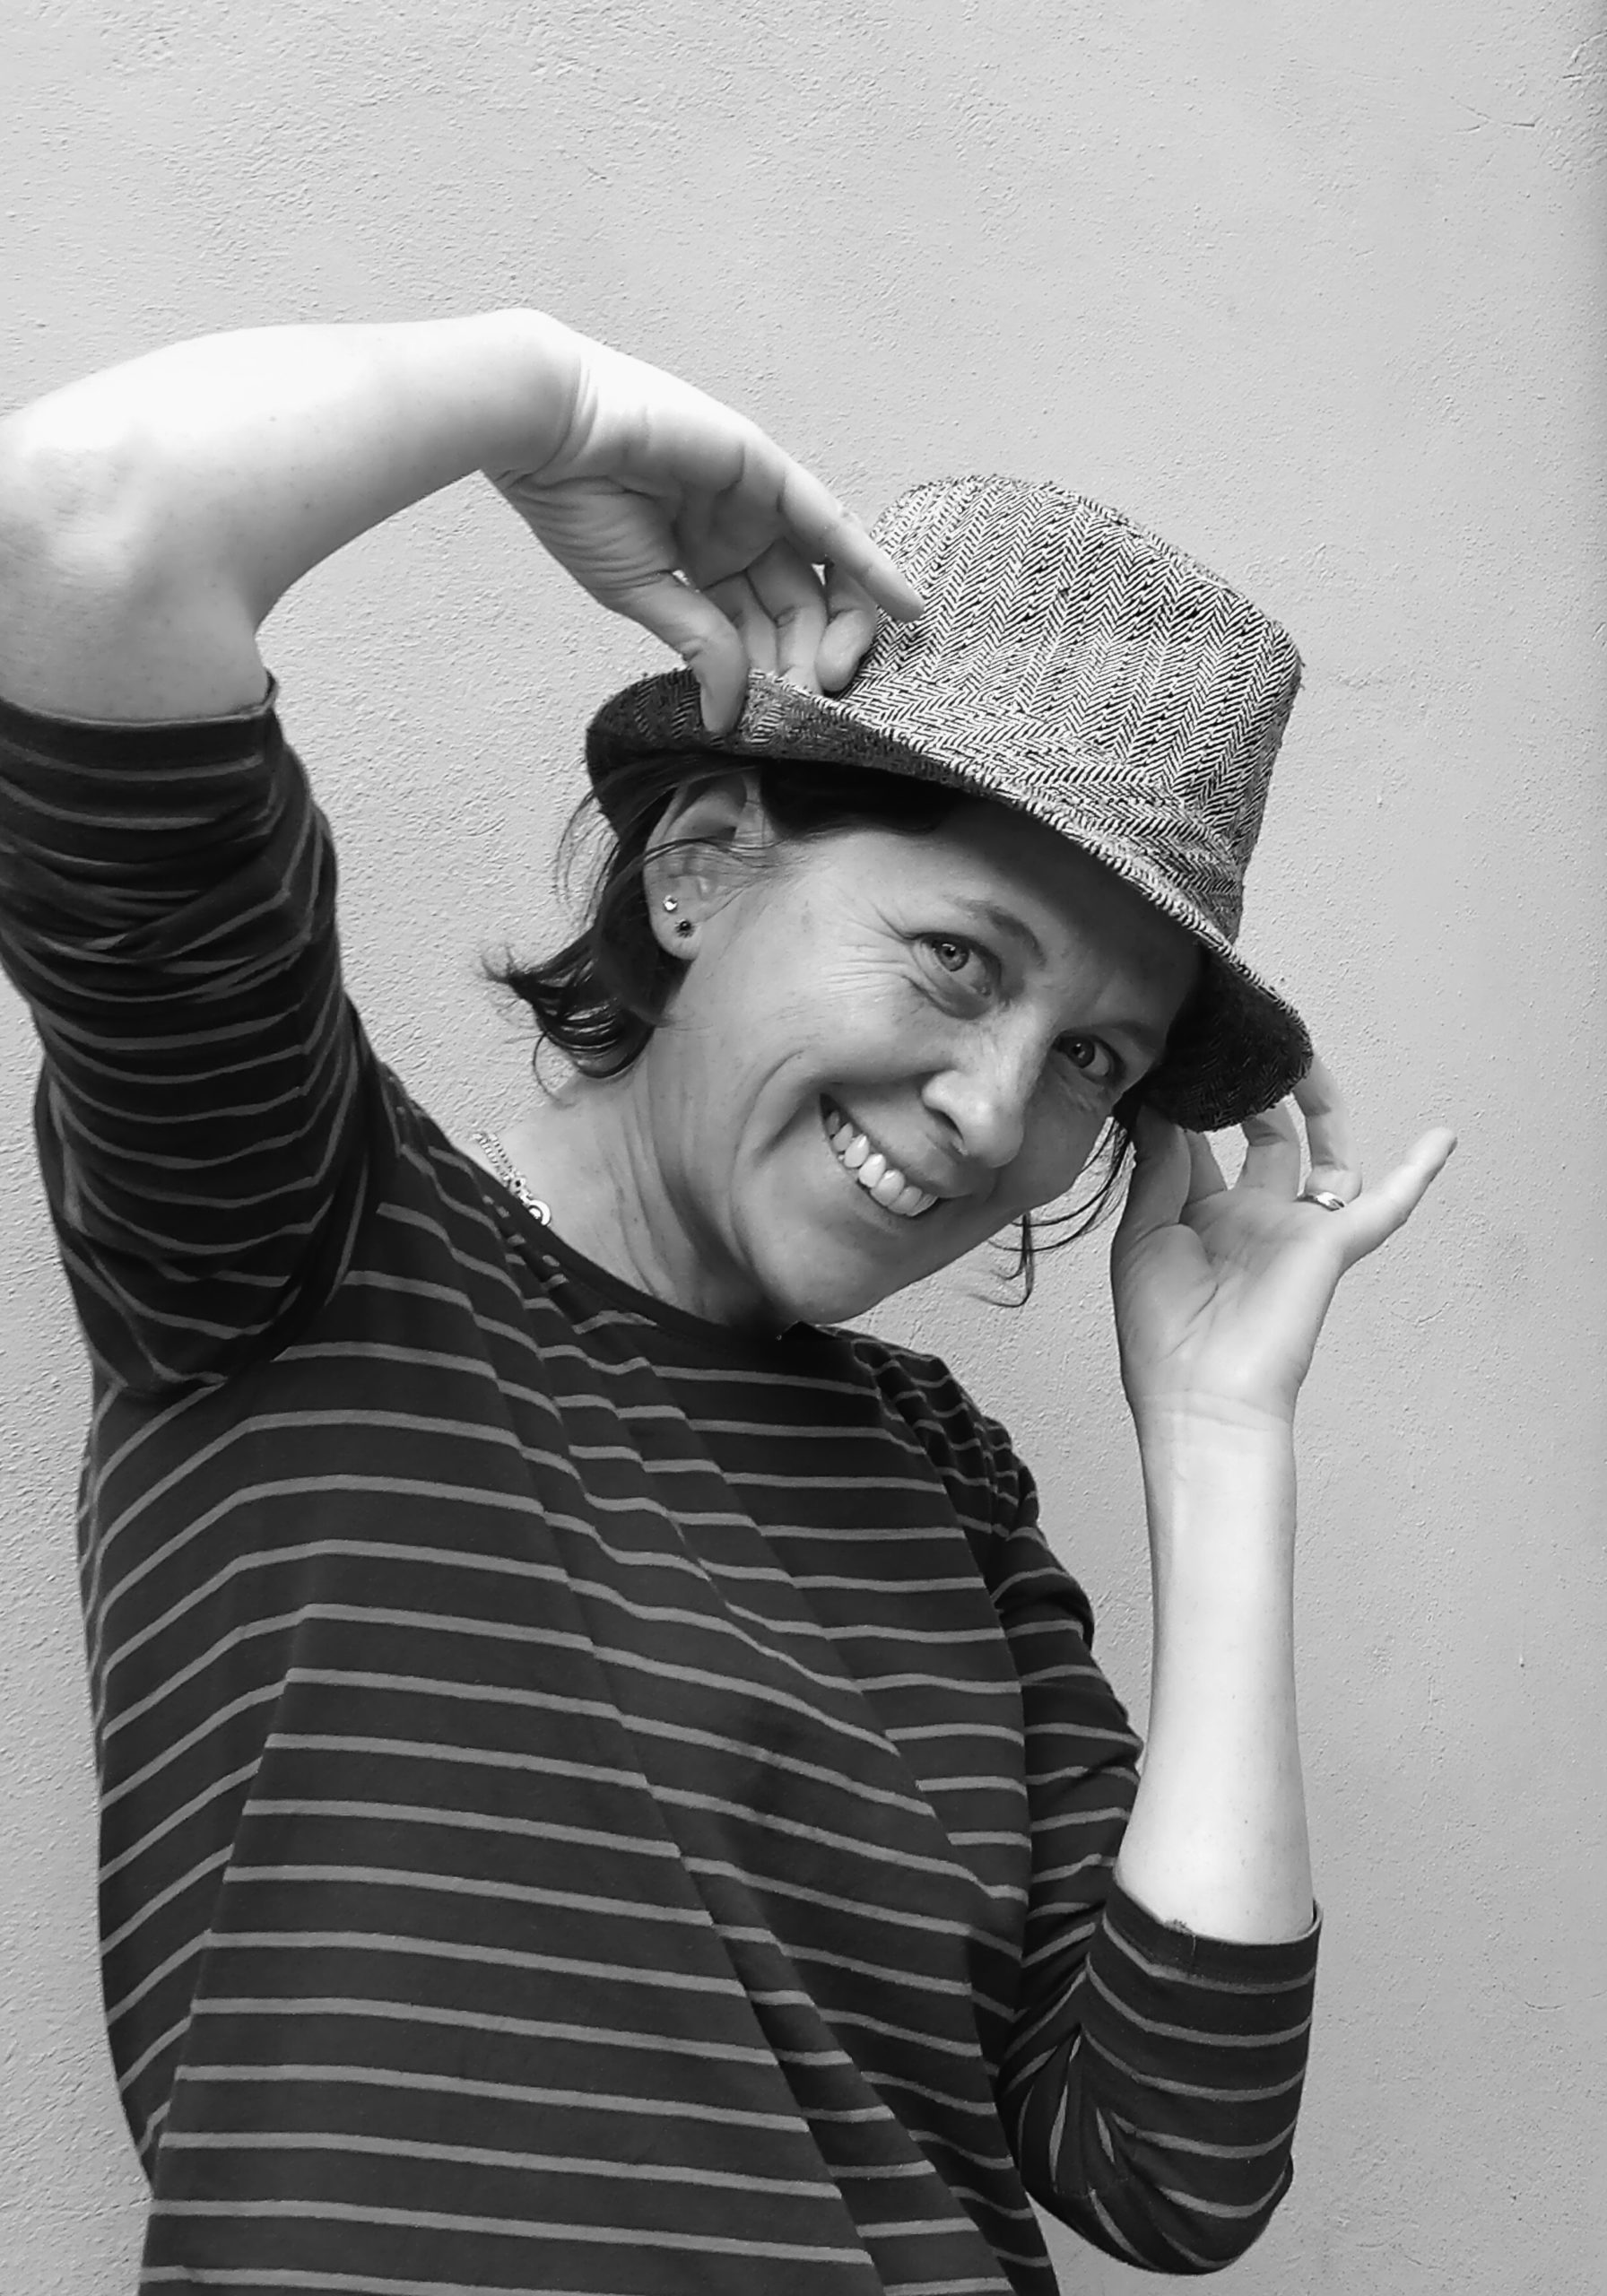 Chiara Cozzi